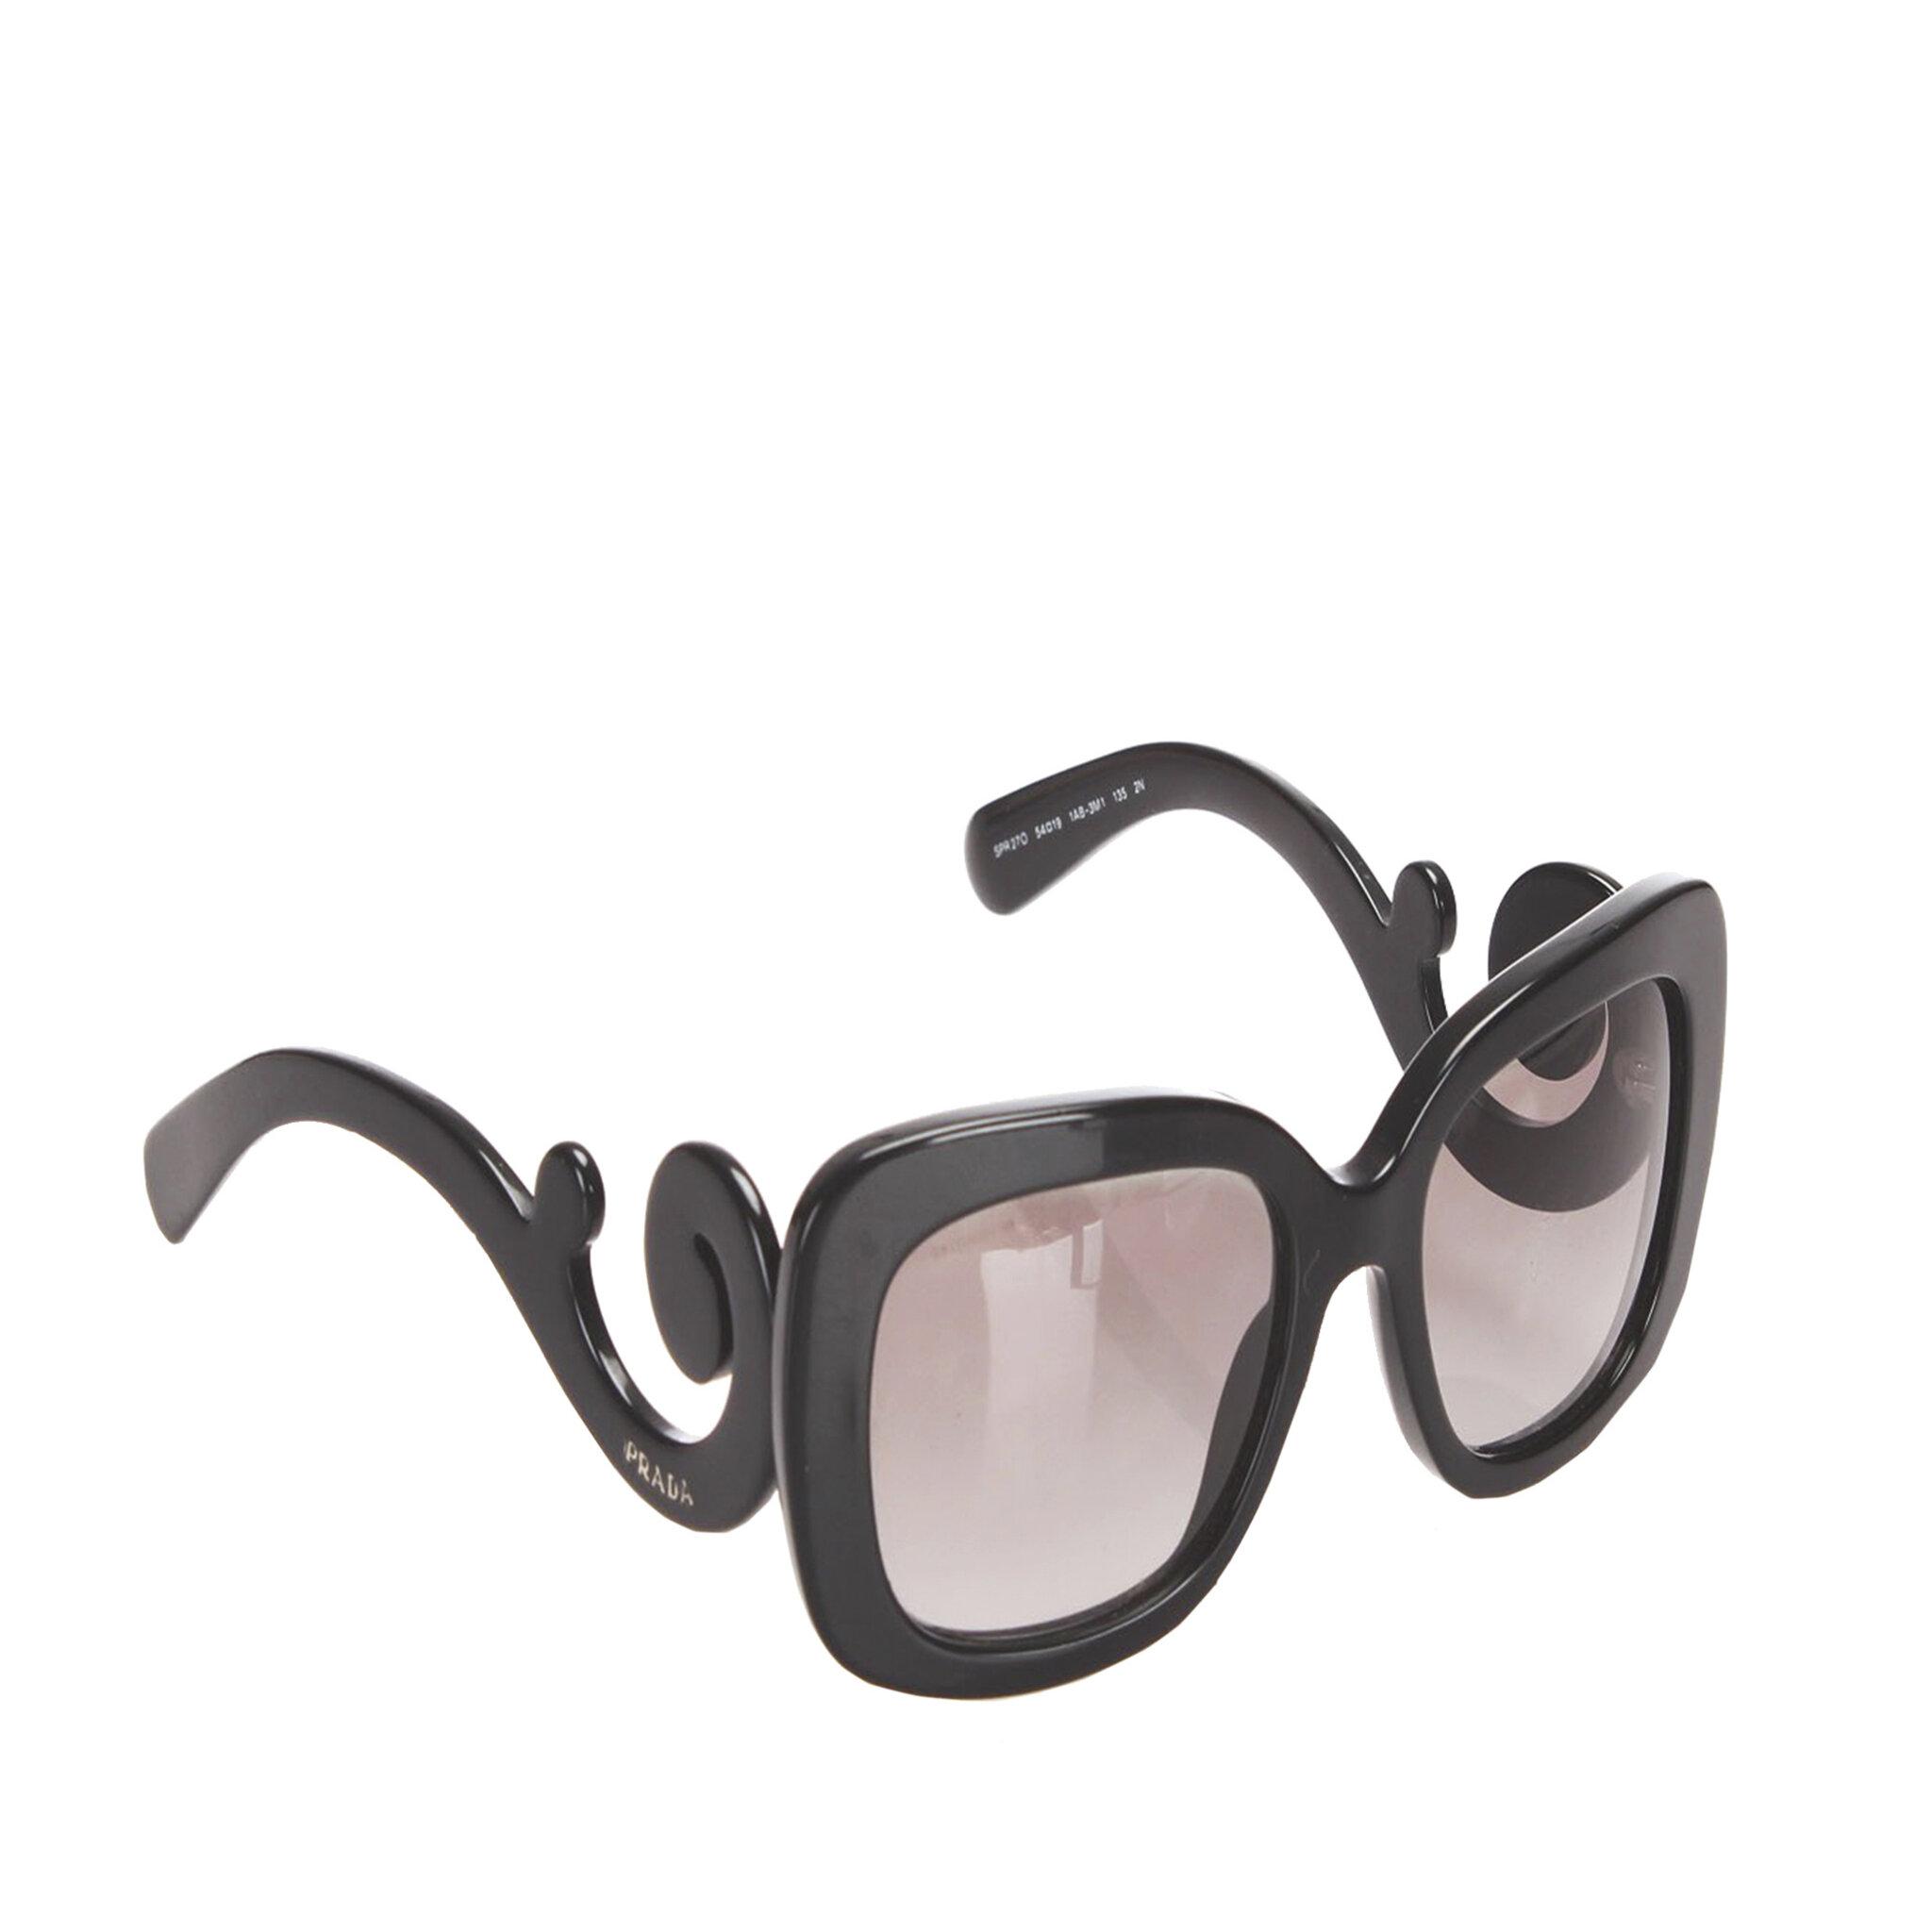 Prada Baroque Square Sunglasses, ONESIZE